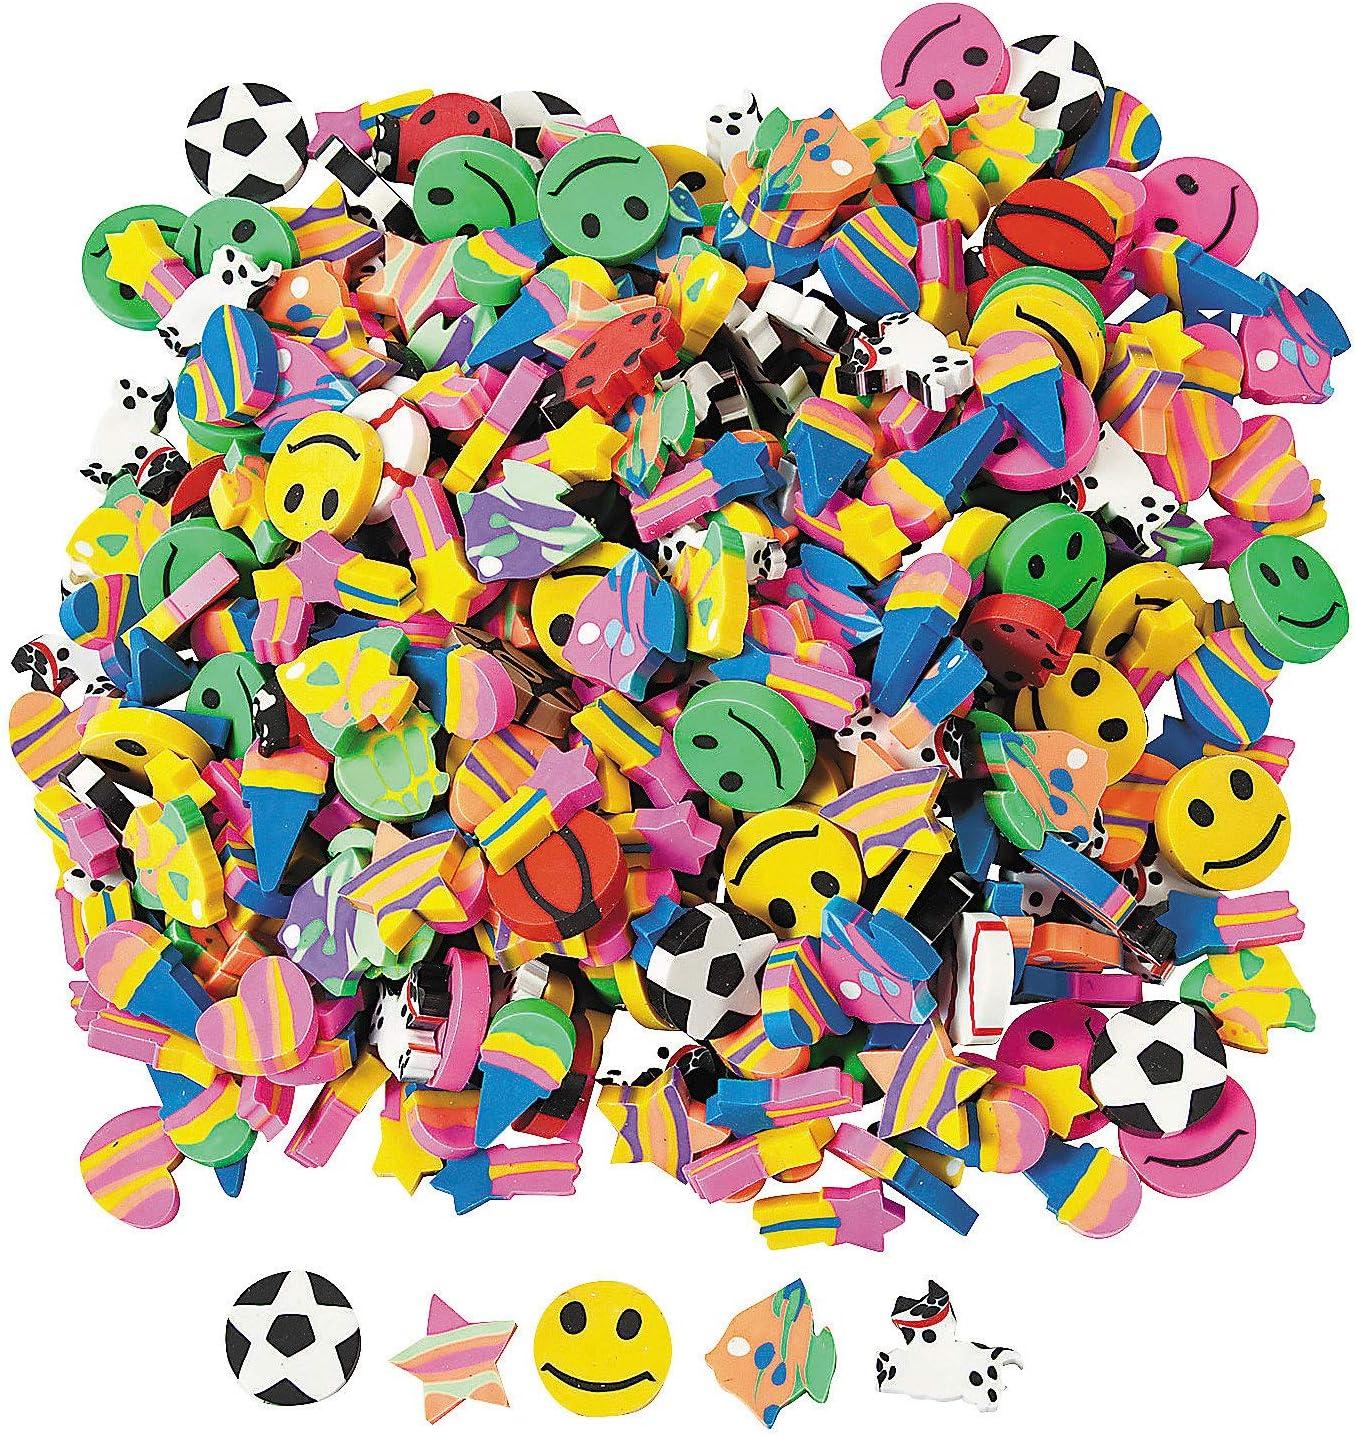 Mini Eraser Assortment (500PC) - Stationery - 500 Pieces